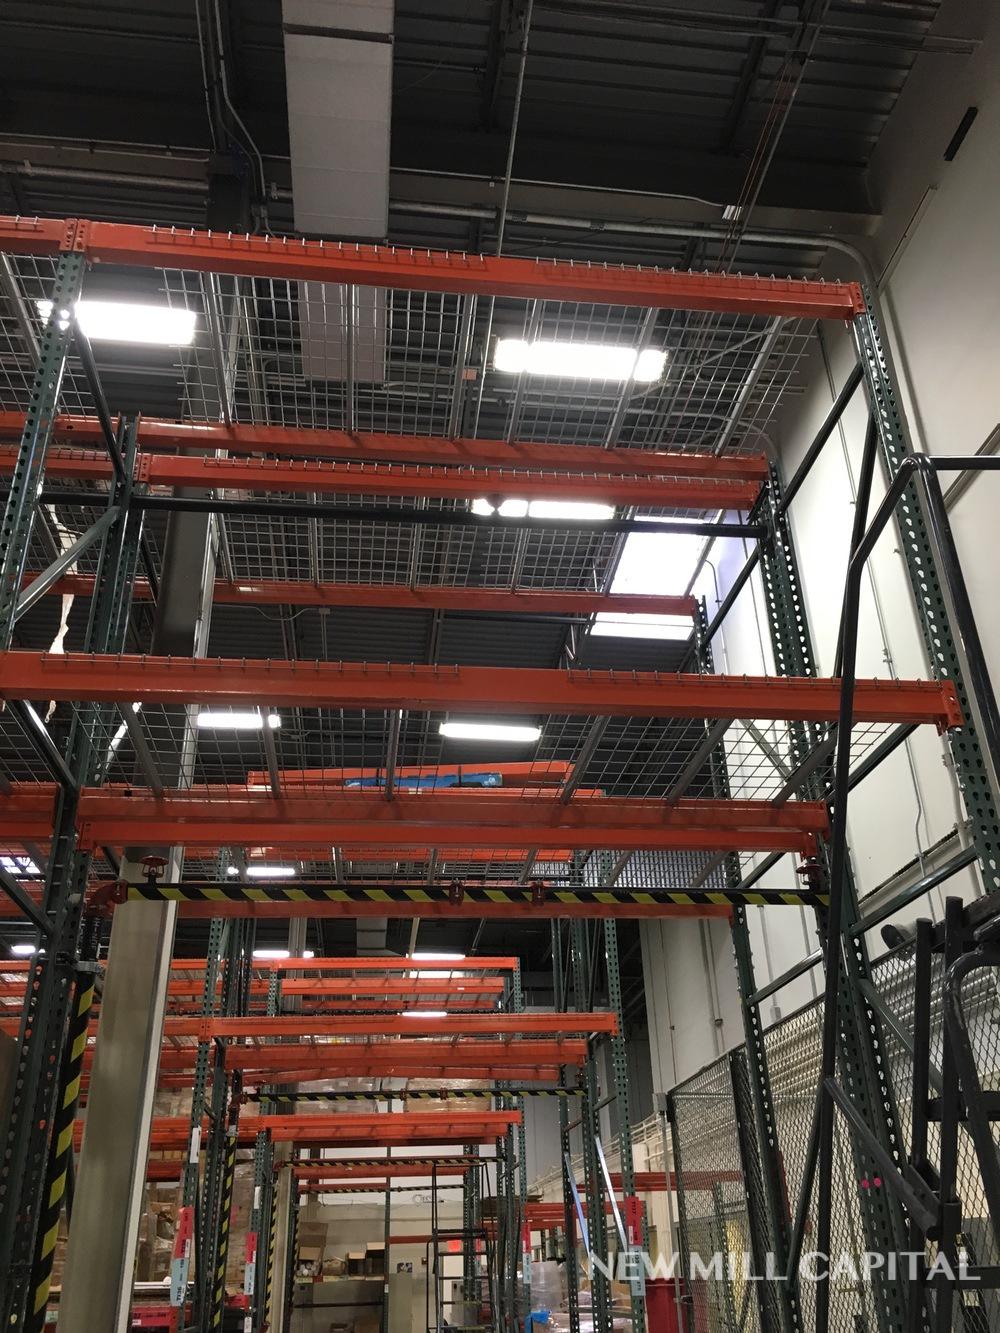 Lot 28 - Interlake Teardrop Pallet Rack, (10) Uprights (3in x 1.625in Columns, 42i | Rig: See Lot Description